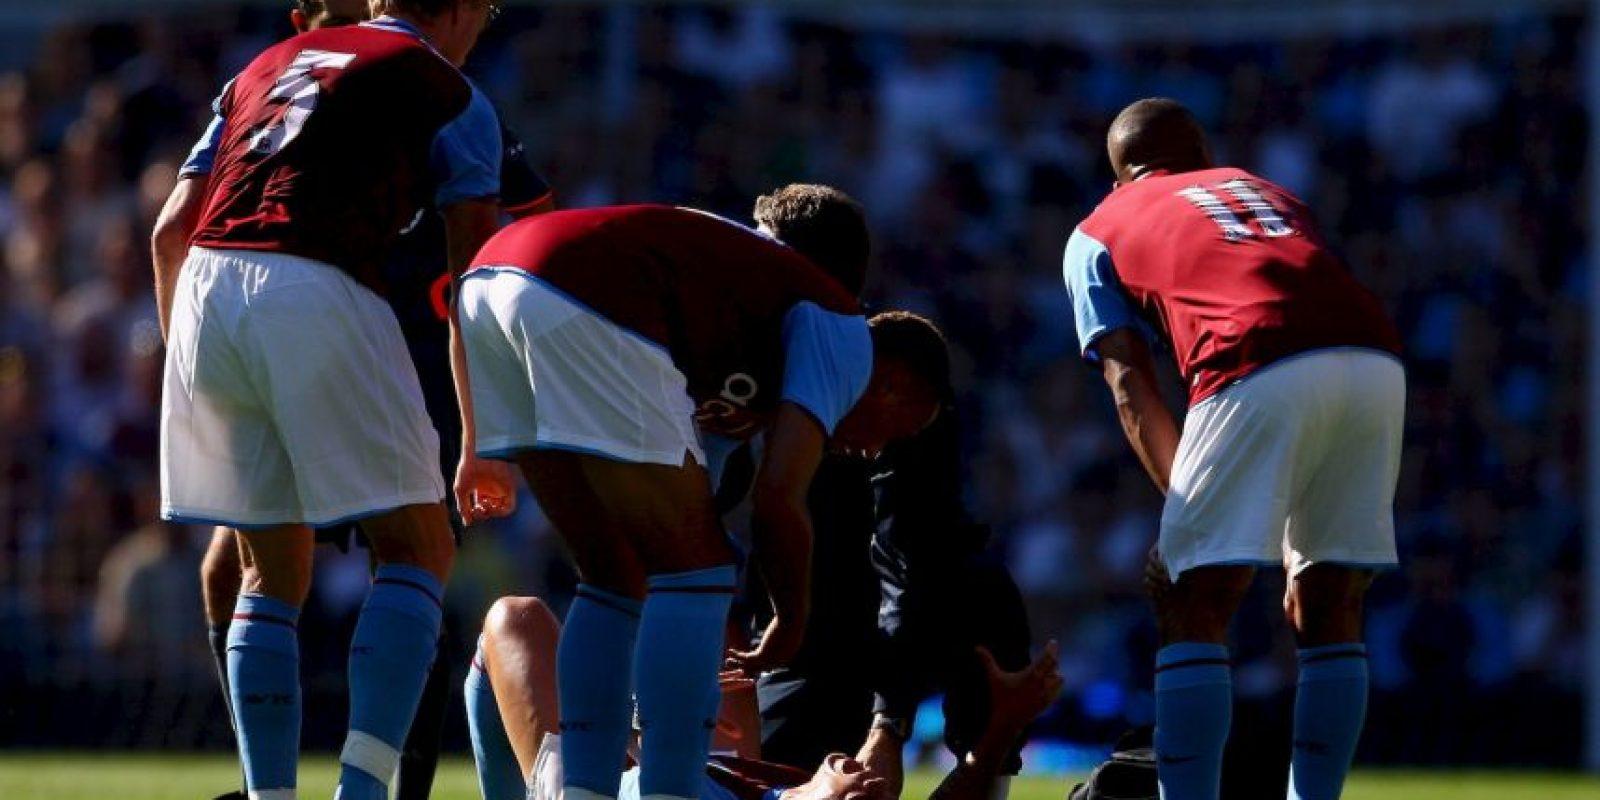 Se dislocó el tobillo. Foto:Getty Images